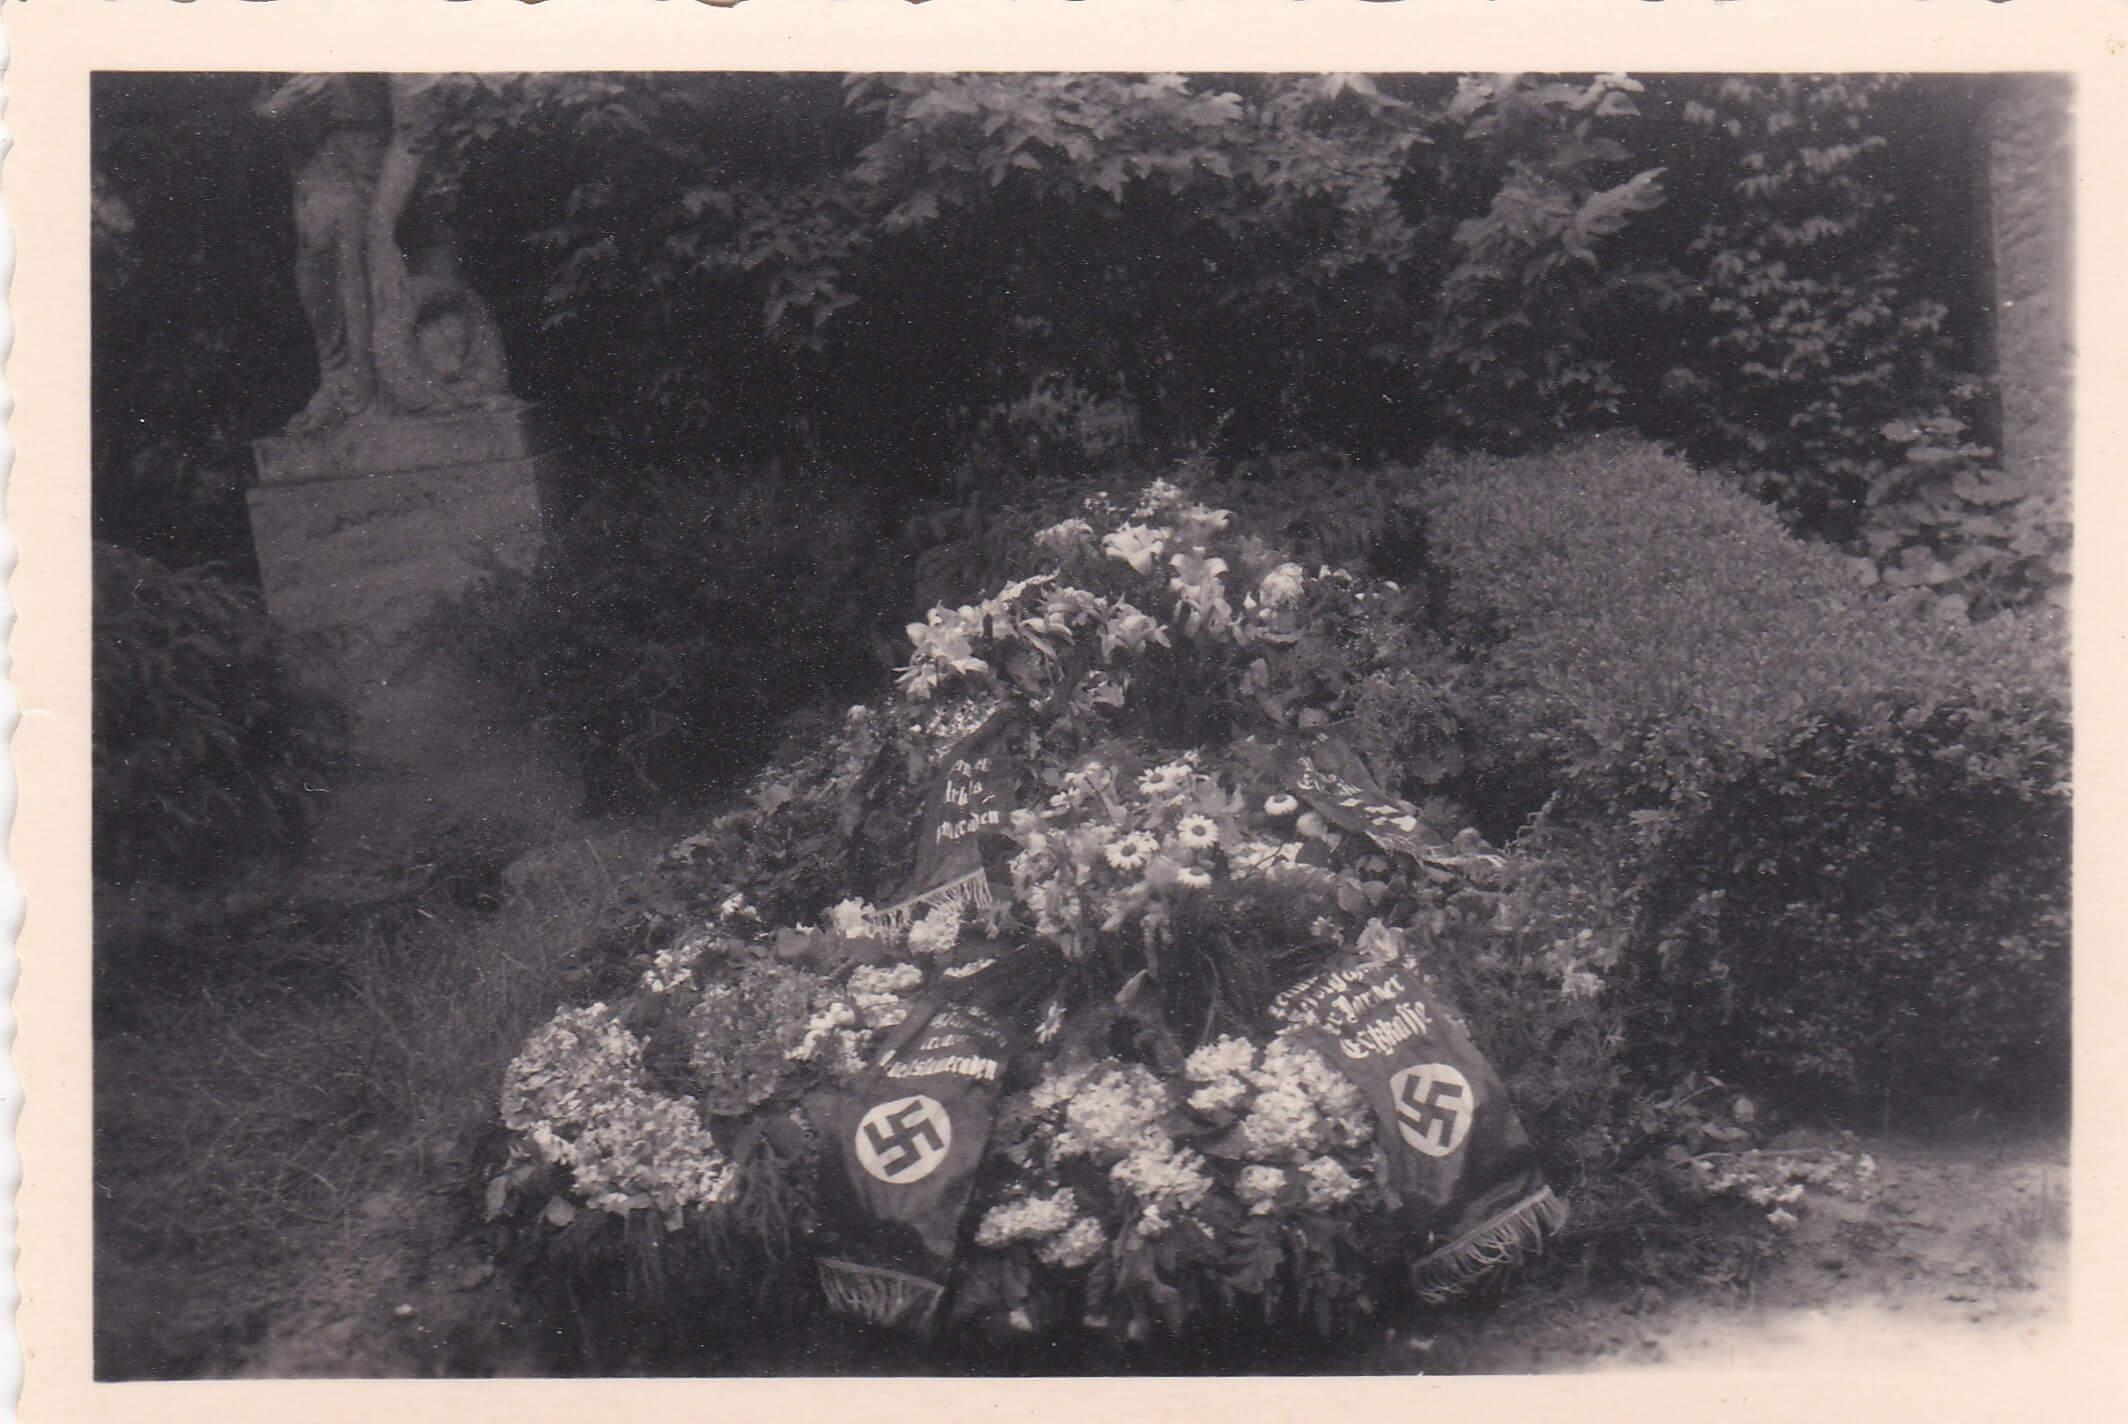 Duits graf monument wo2 hakenkruis